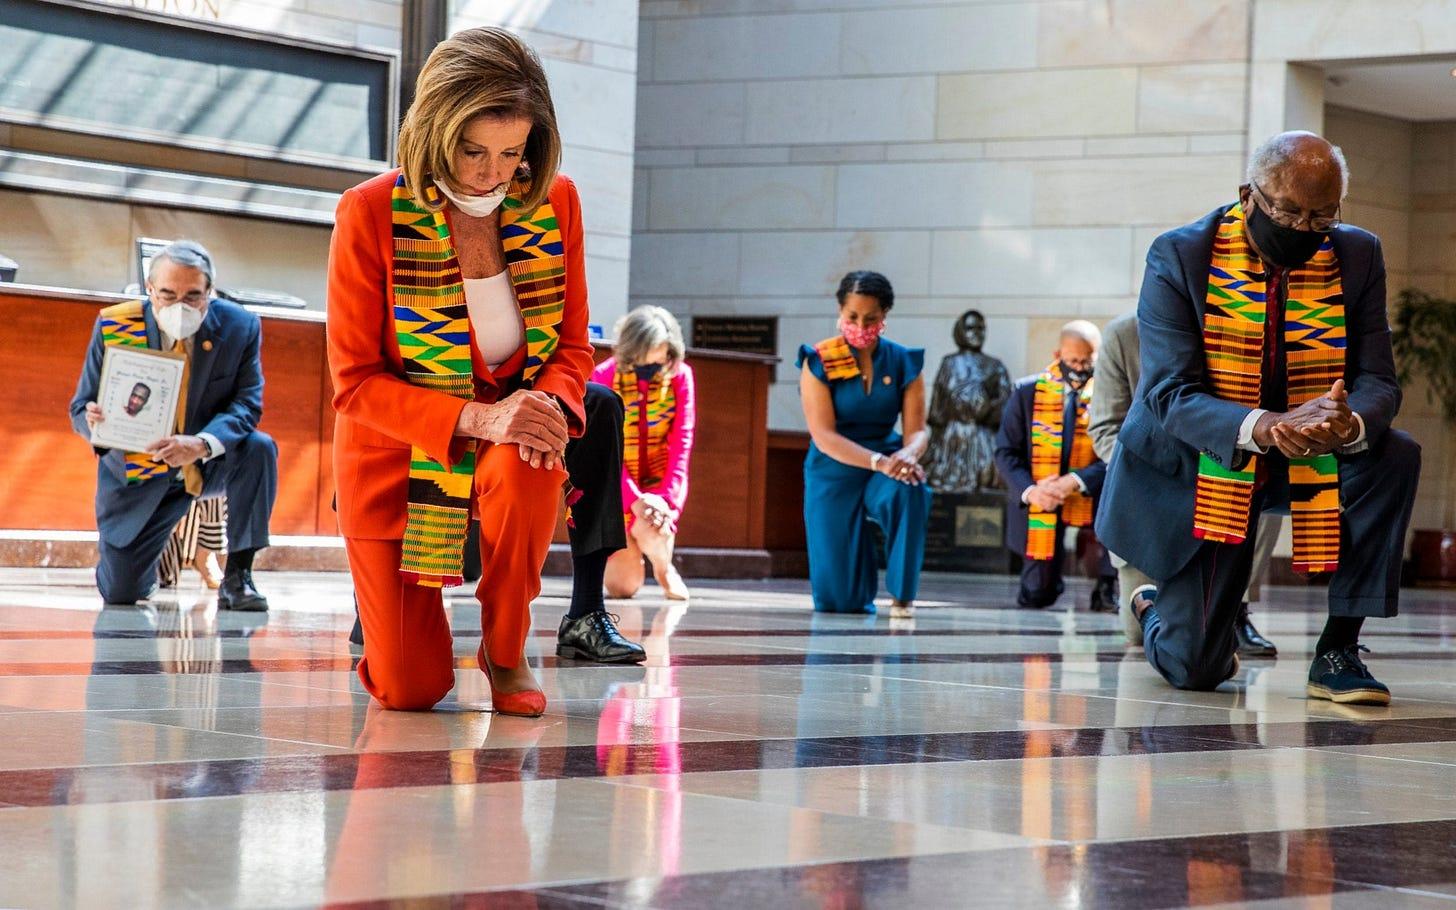 image of Nancy Pelosi and members of congress wearing kente cloth scarves and kneeling